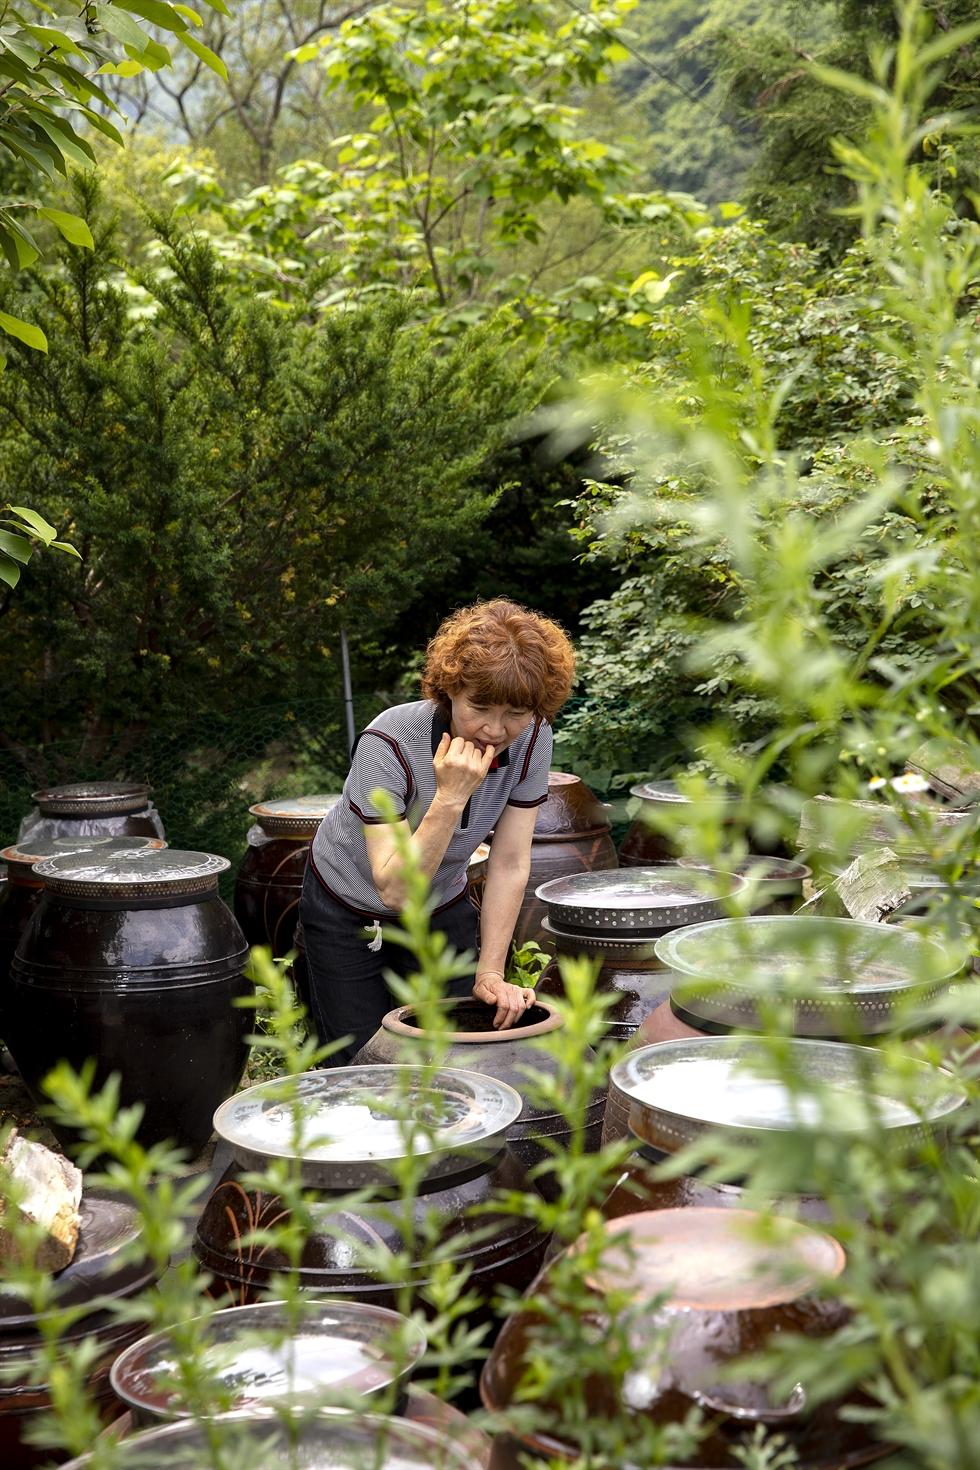 Park tastes her homemade soybean paste in a jar near her home. Korea Times photo by Shim Hyun-chul